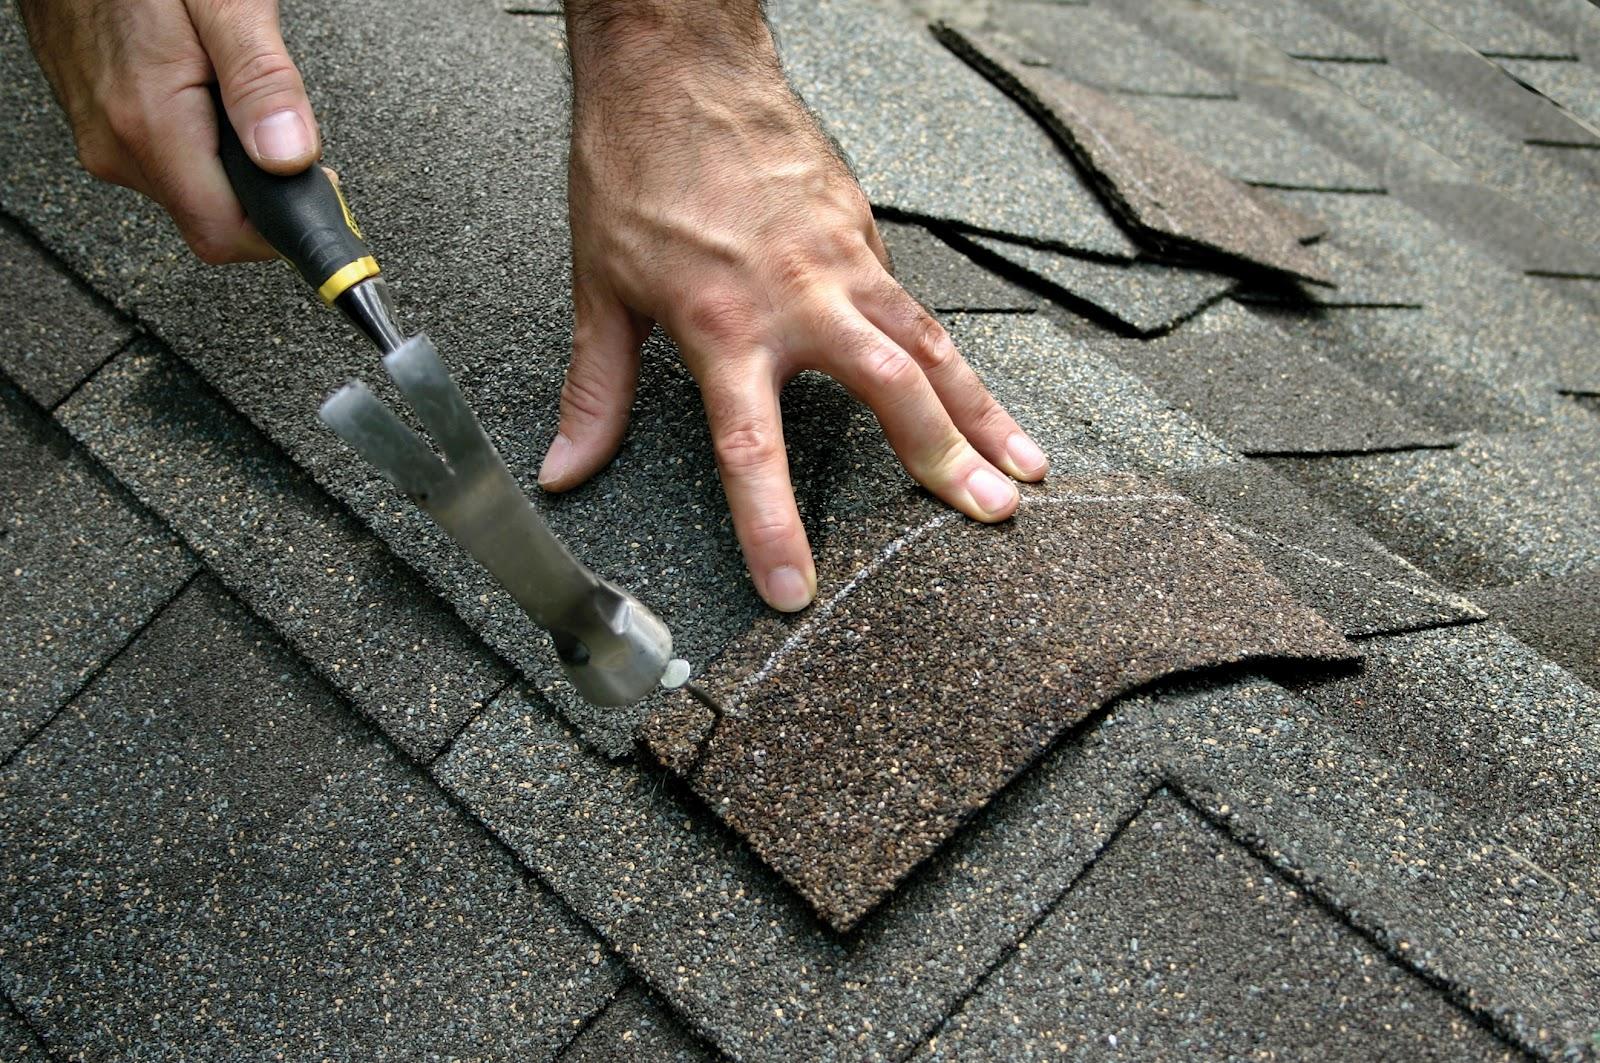 repair-Roofing-houston-texas